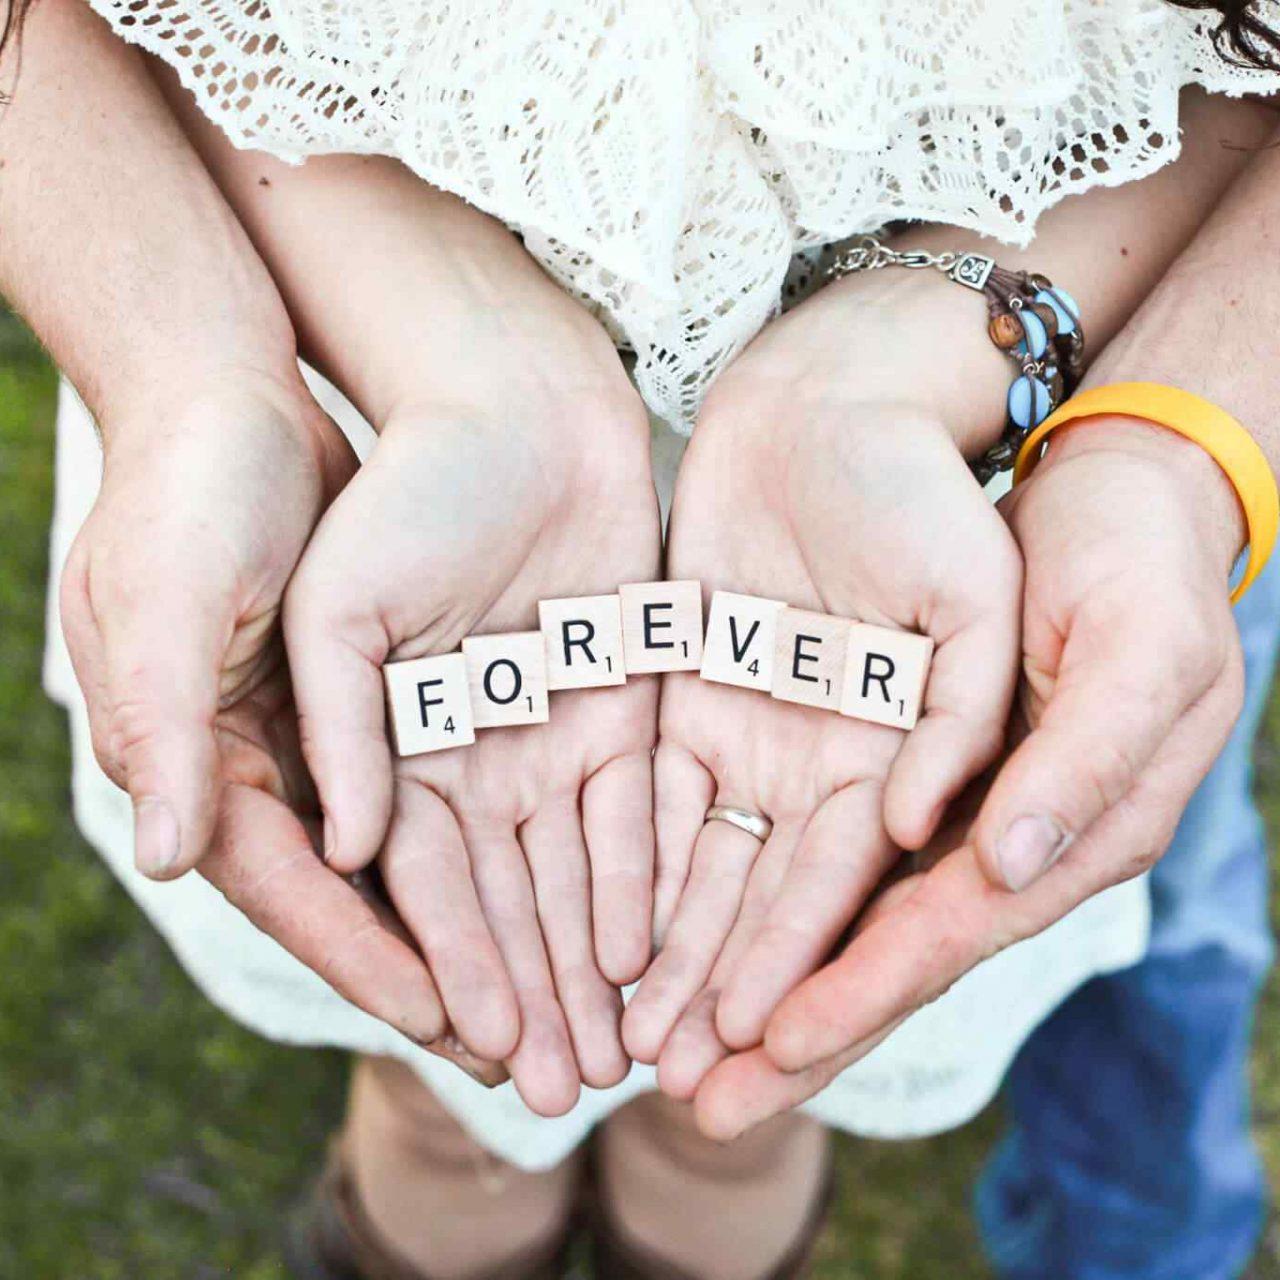 https://gotitasdepoliamor.com/wp-content/uploads/2018/01/img-event-marriage-03-1280x1280.jpg